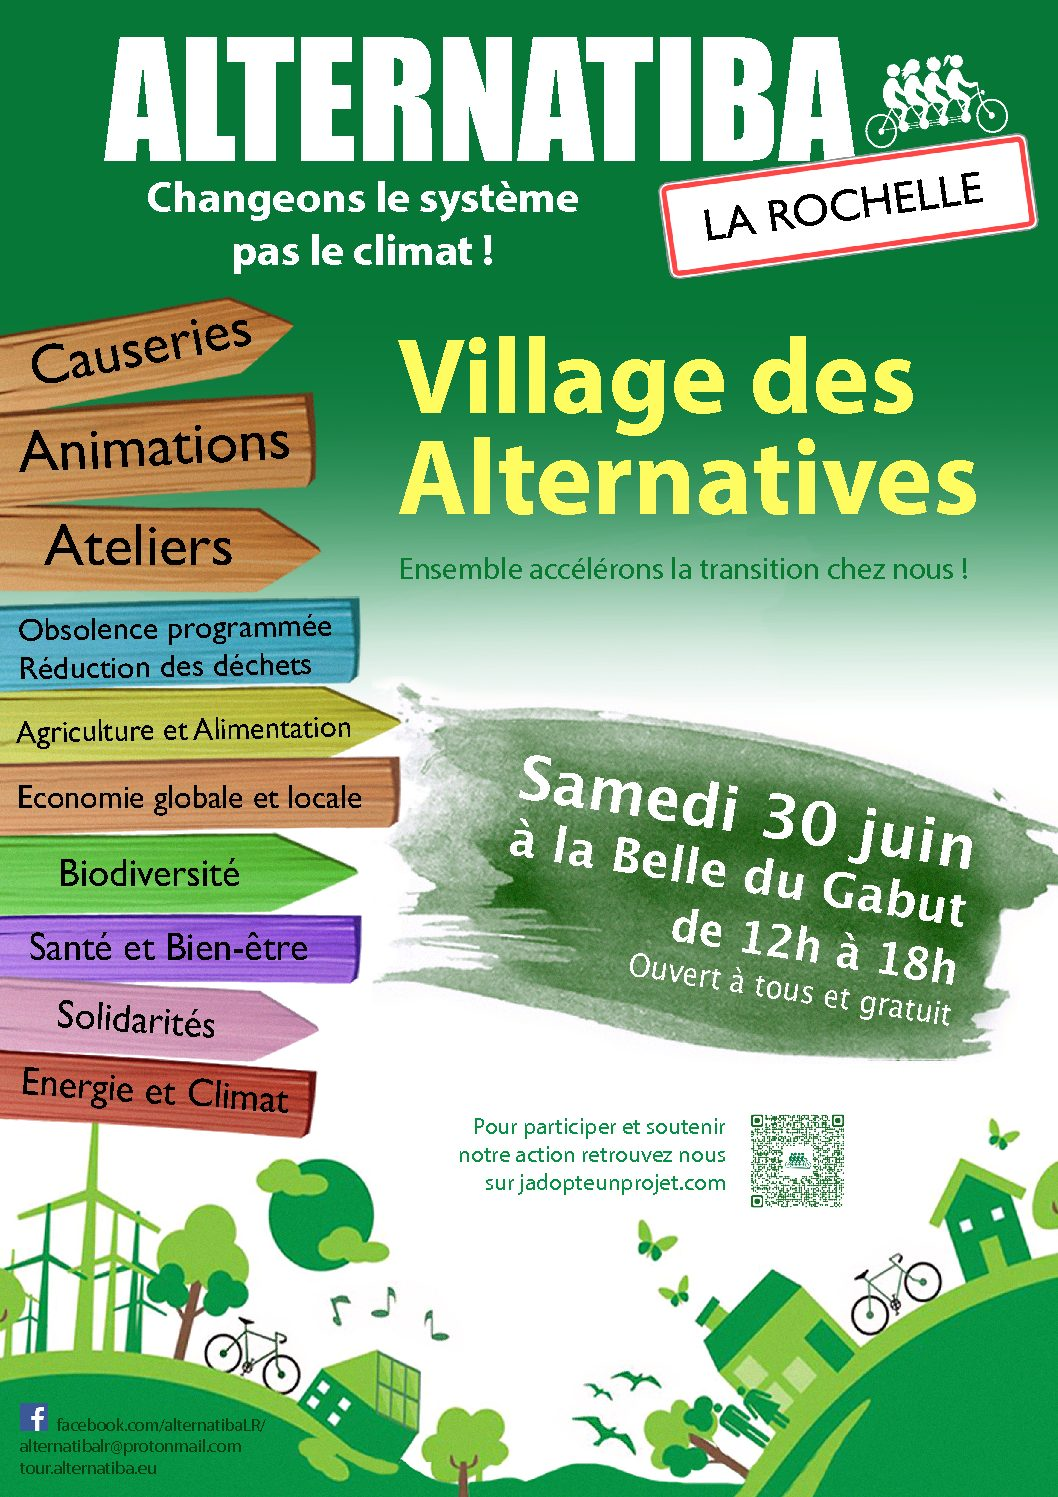 Village des alternatives Alternatiba la Rochelle